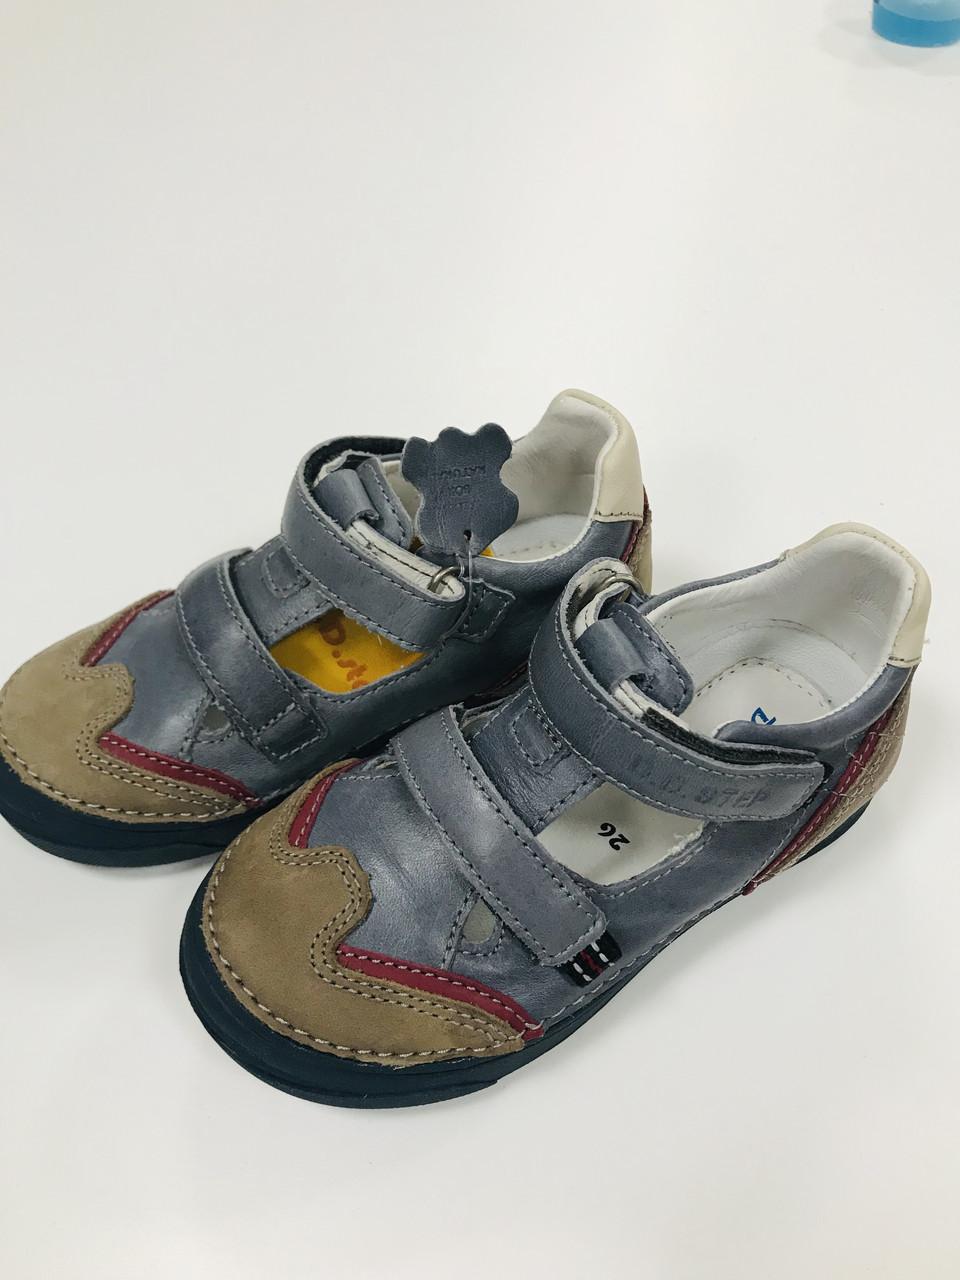 Туфли для мальчика D.D.Step 040-438 размер 27